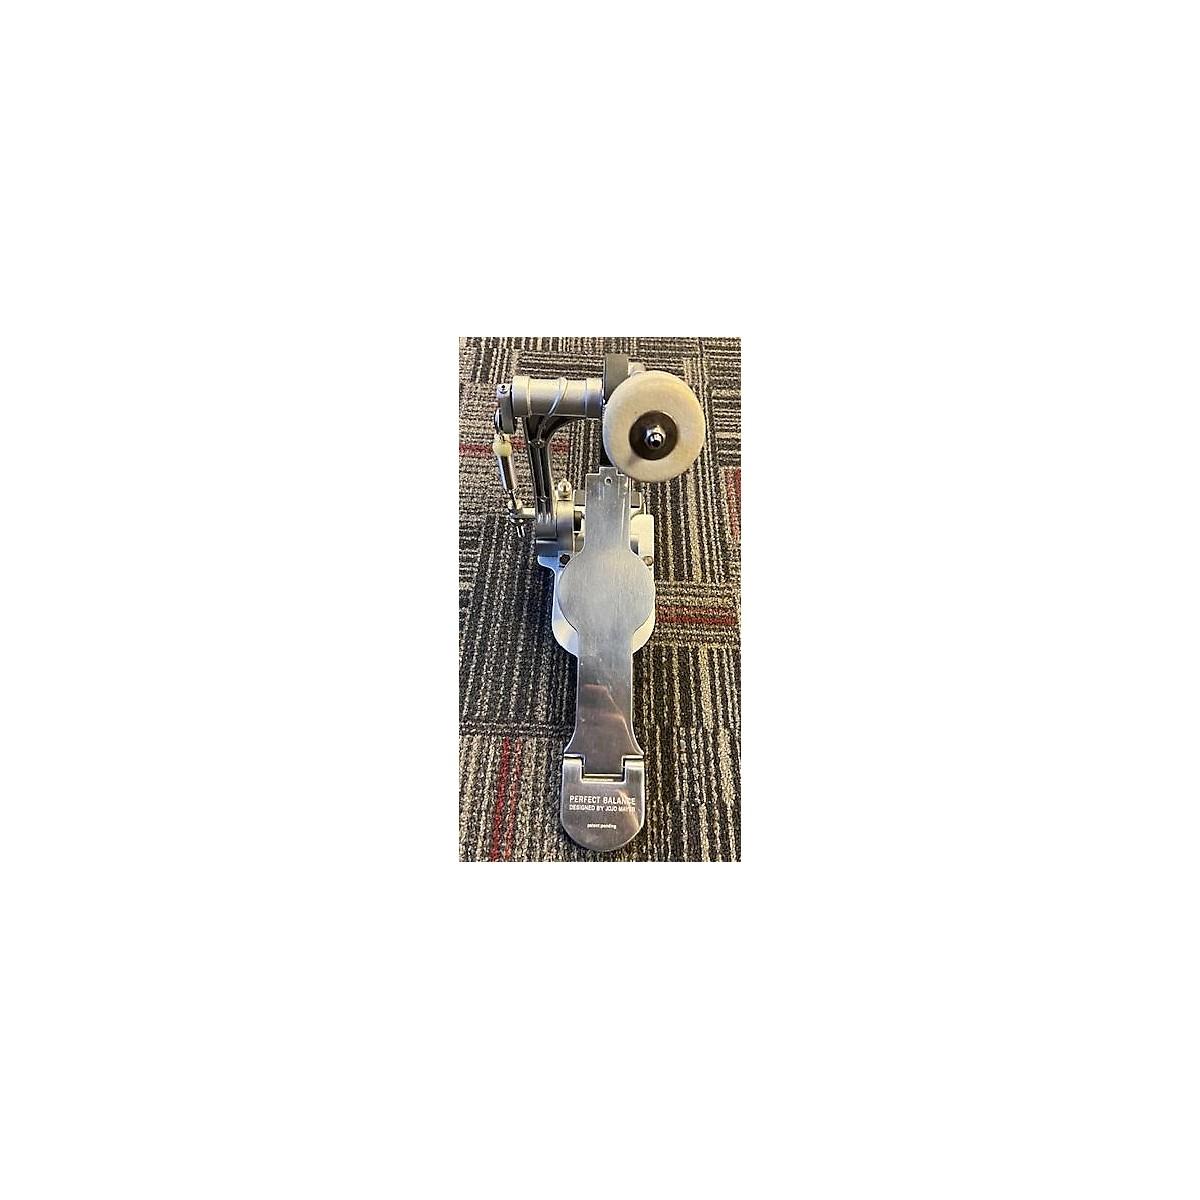 SONOR Perfect Balance By Jojo Mayer Single Bass Drum Pedal